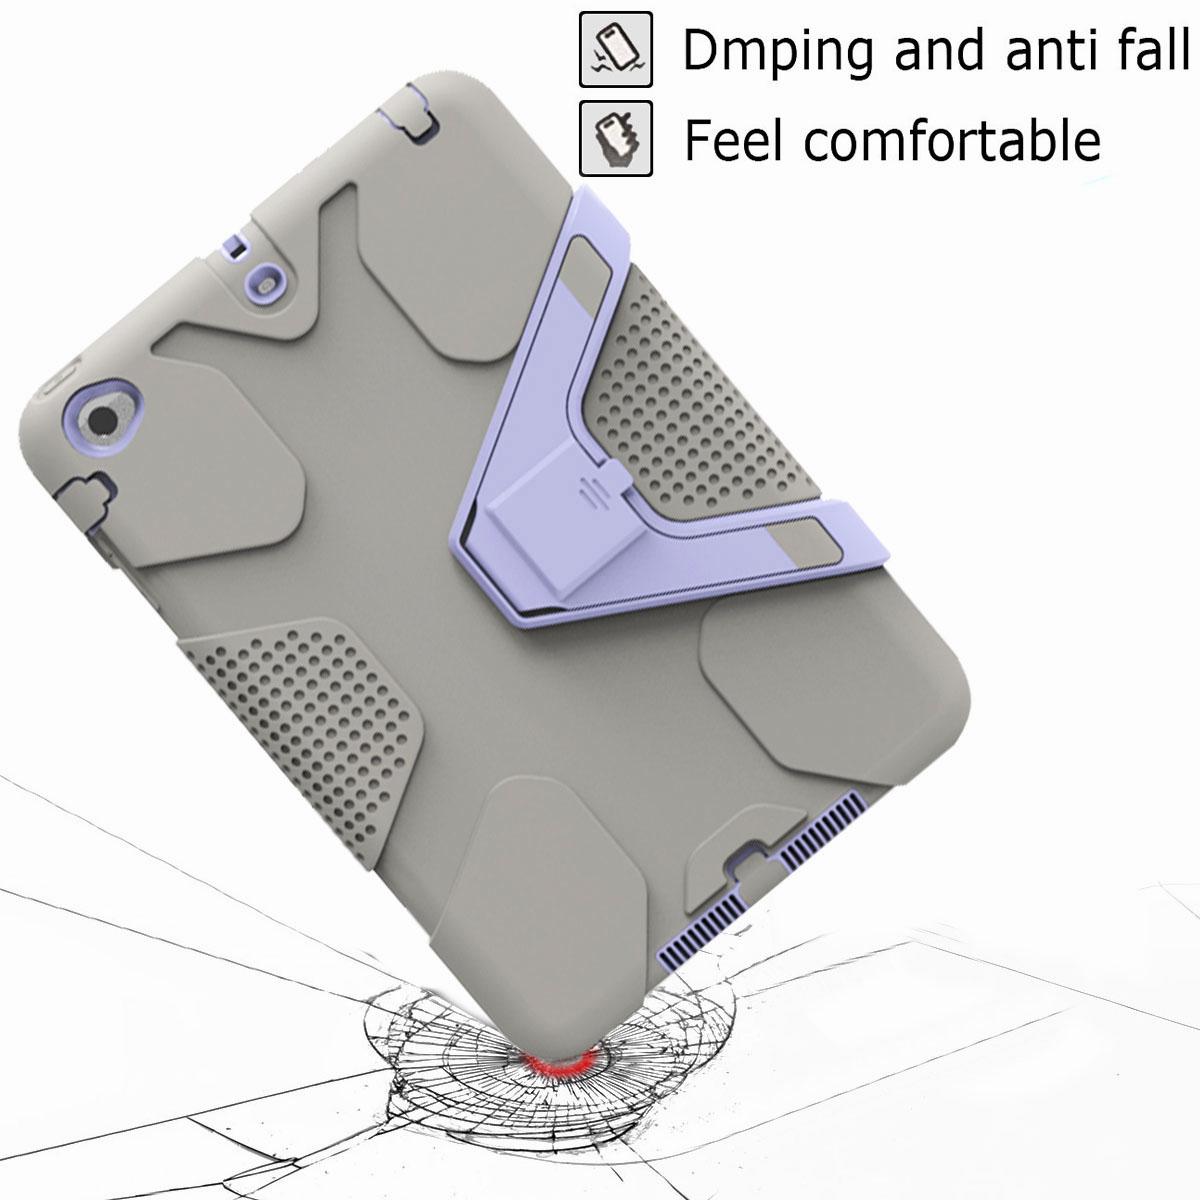 Luxury-Shockproof-Tough-Armor-with-Hard-Kickstand-Case-For-Apple-iPad-Mini-1-2-3 thumbnail 35